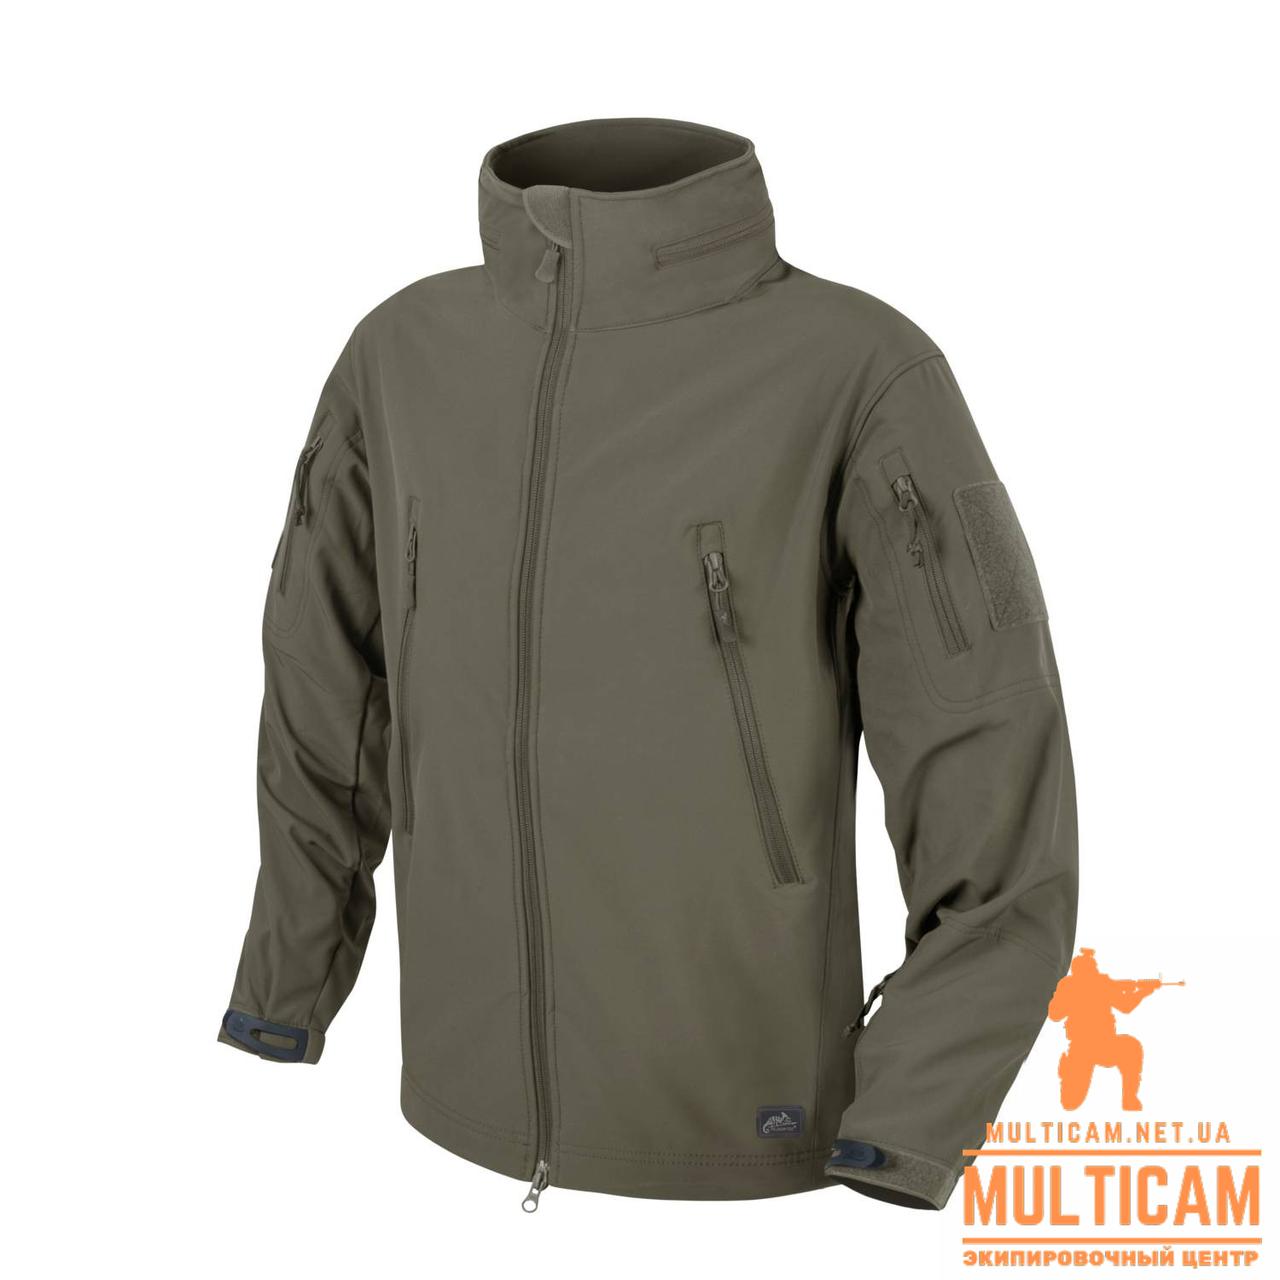 Куртка Helikon-Tex® GUNFIGHTER Jacket - Shark Skin Windblocker - Taiga Green